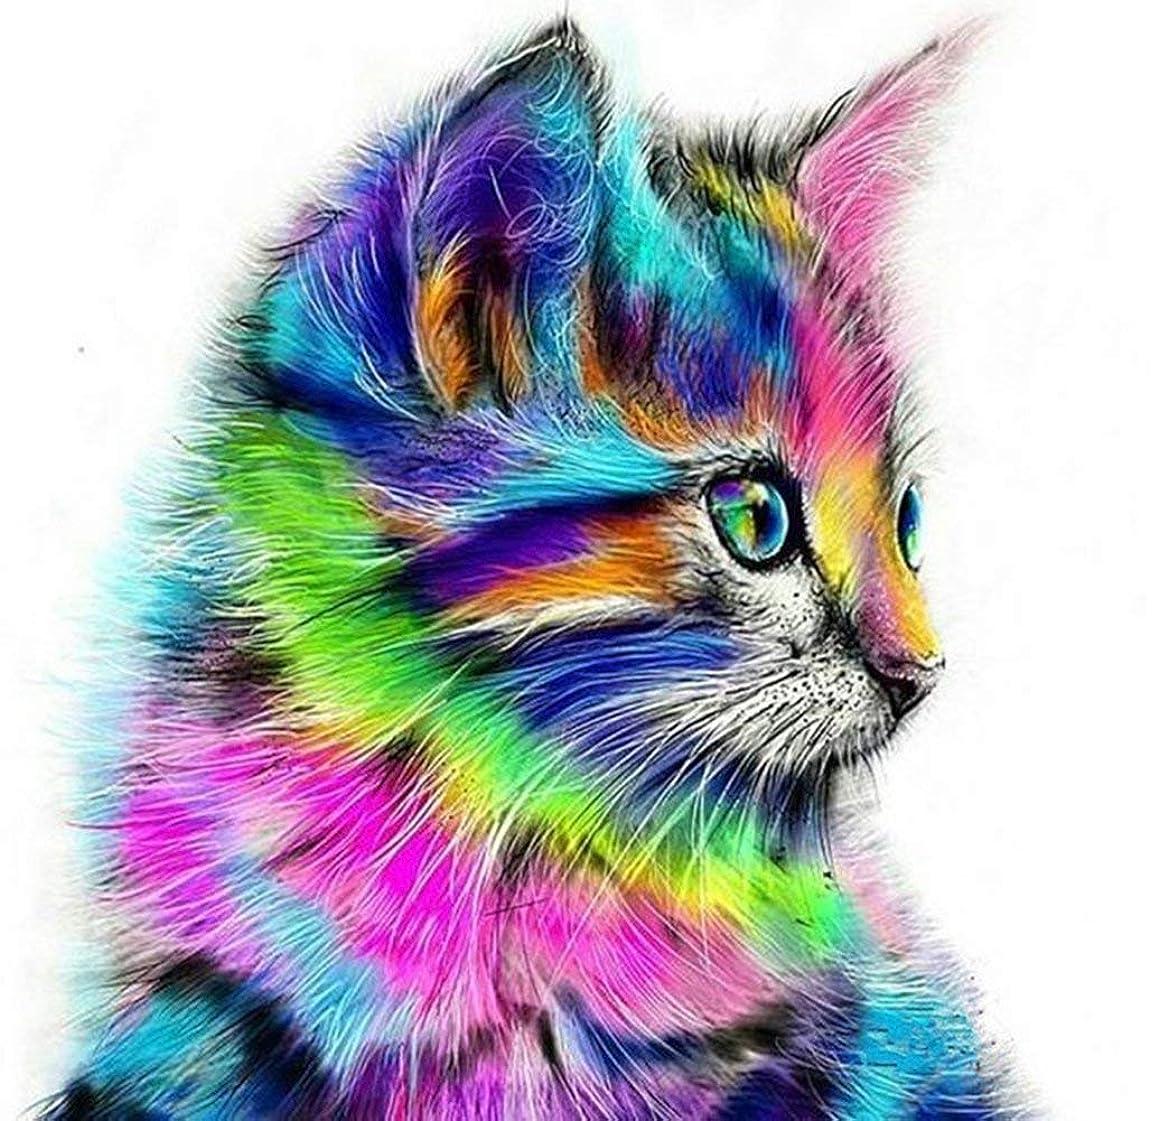 KOTWDQ Large Premium Full 5d Diamond Painting Kits for Adults Full Drill Cute Cat Cross Stitch Arts Craft Canvas Wall Decor,17.7x17.7inch